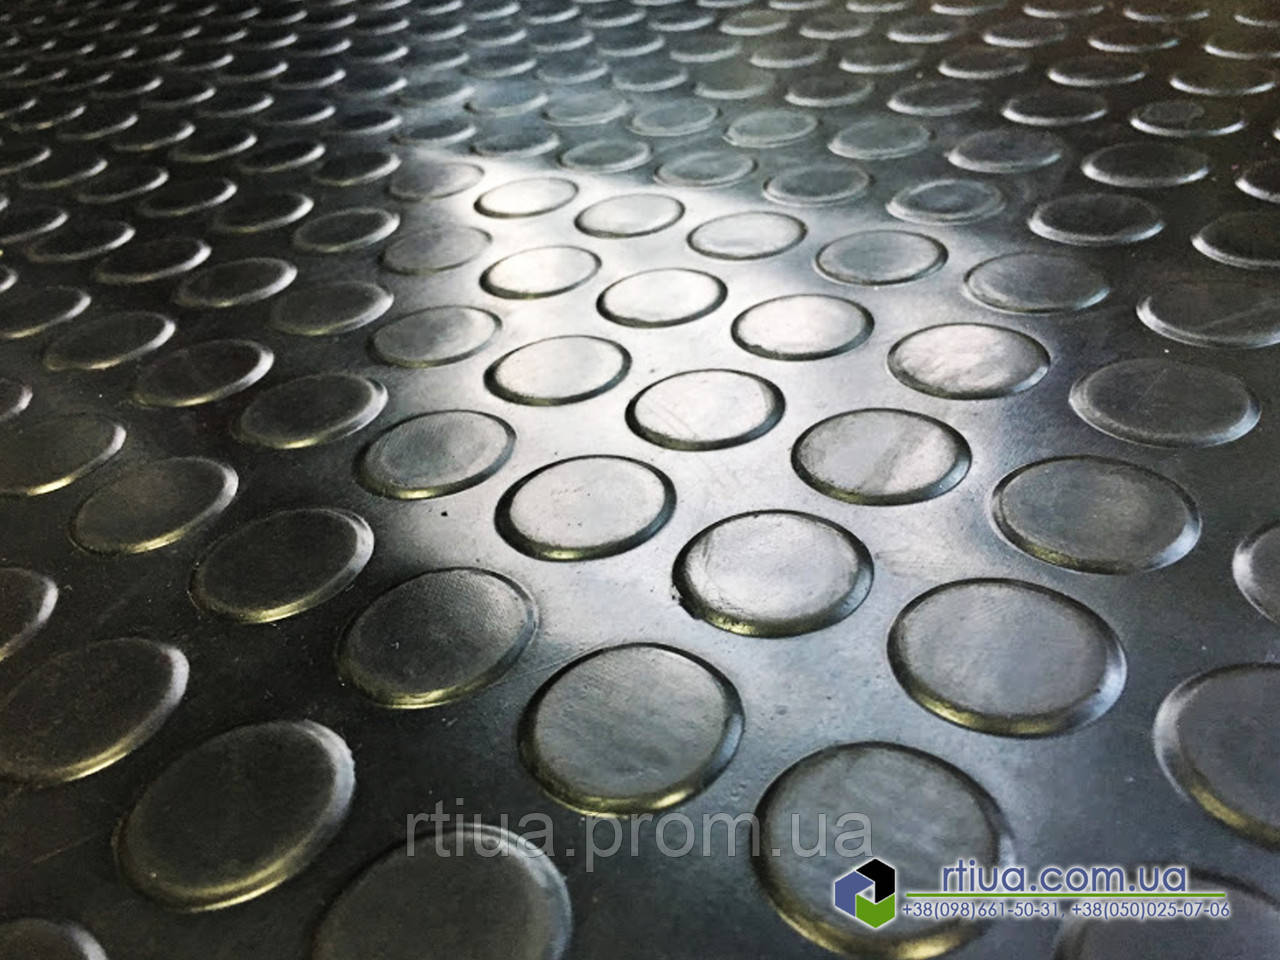 Дорожка резиновая 3 мм монетка 1,5 м